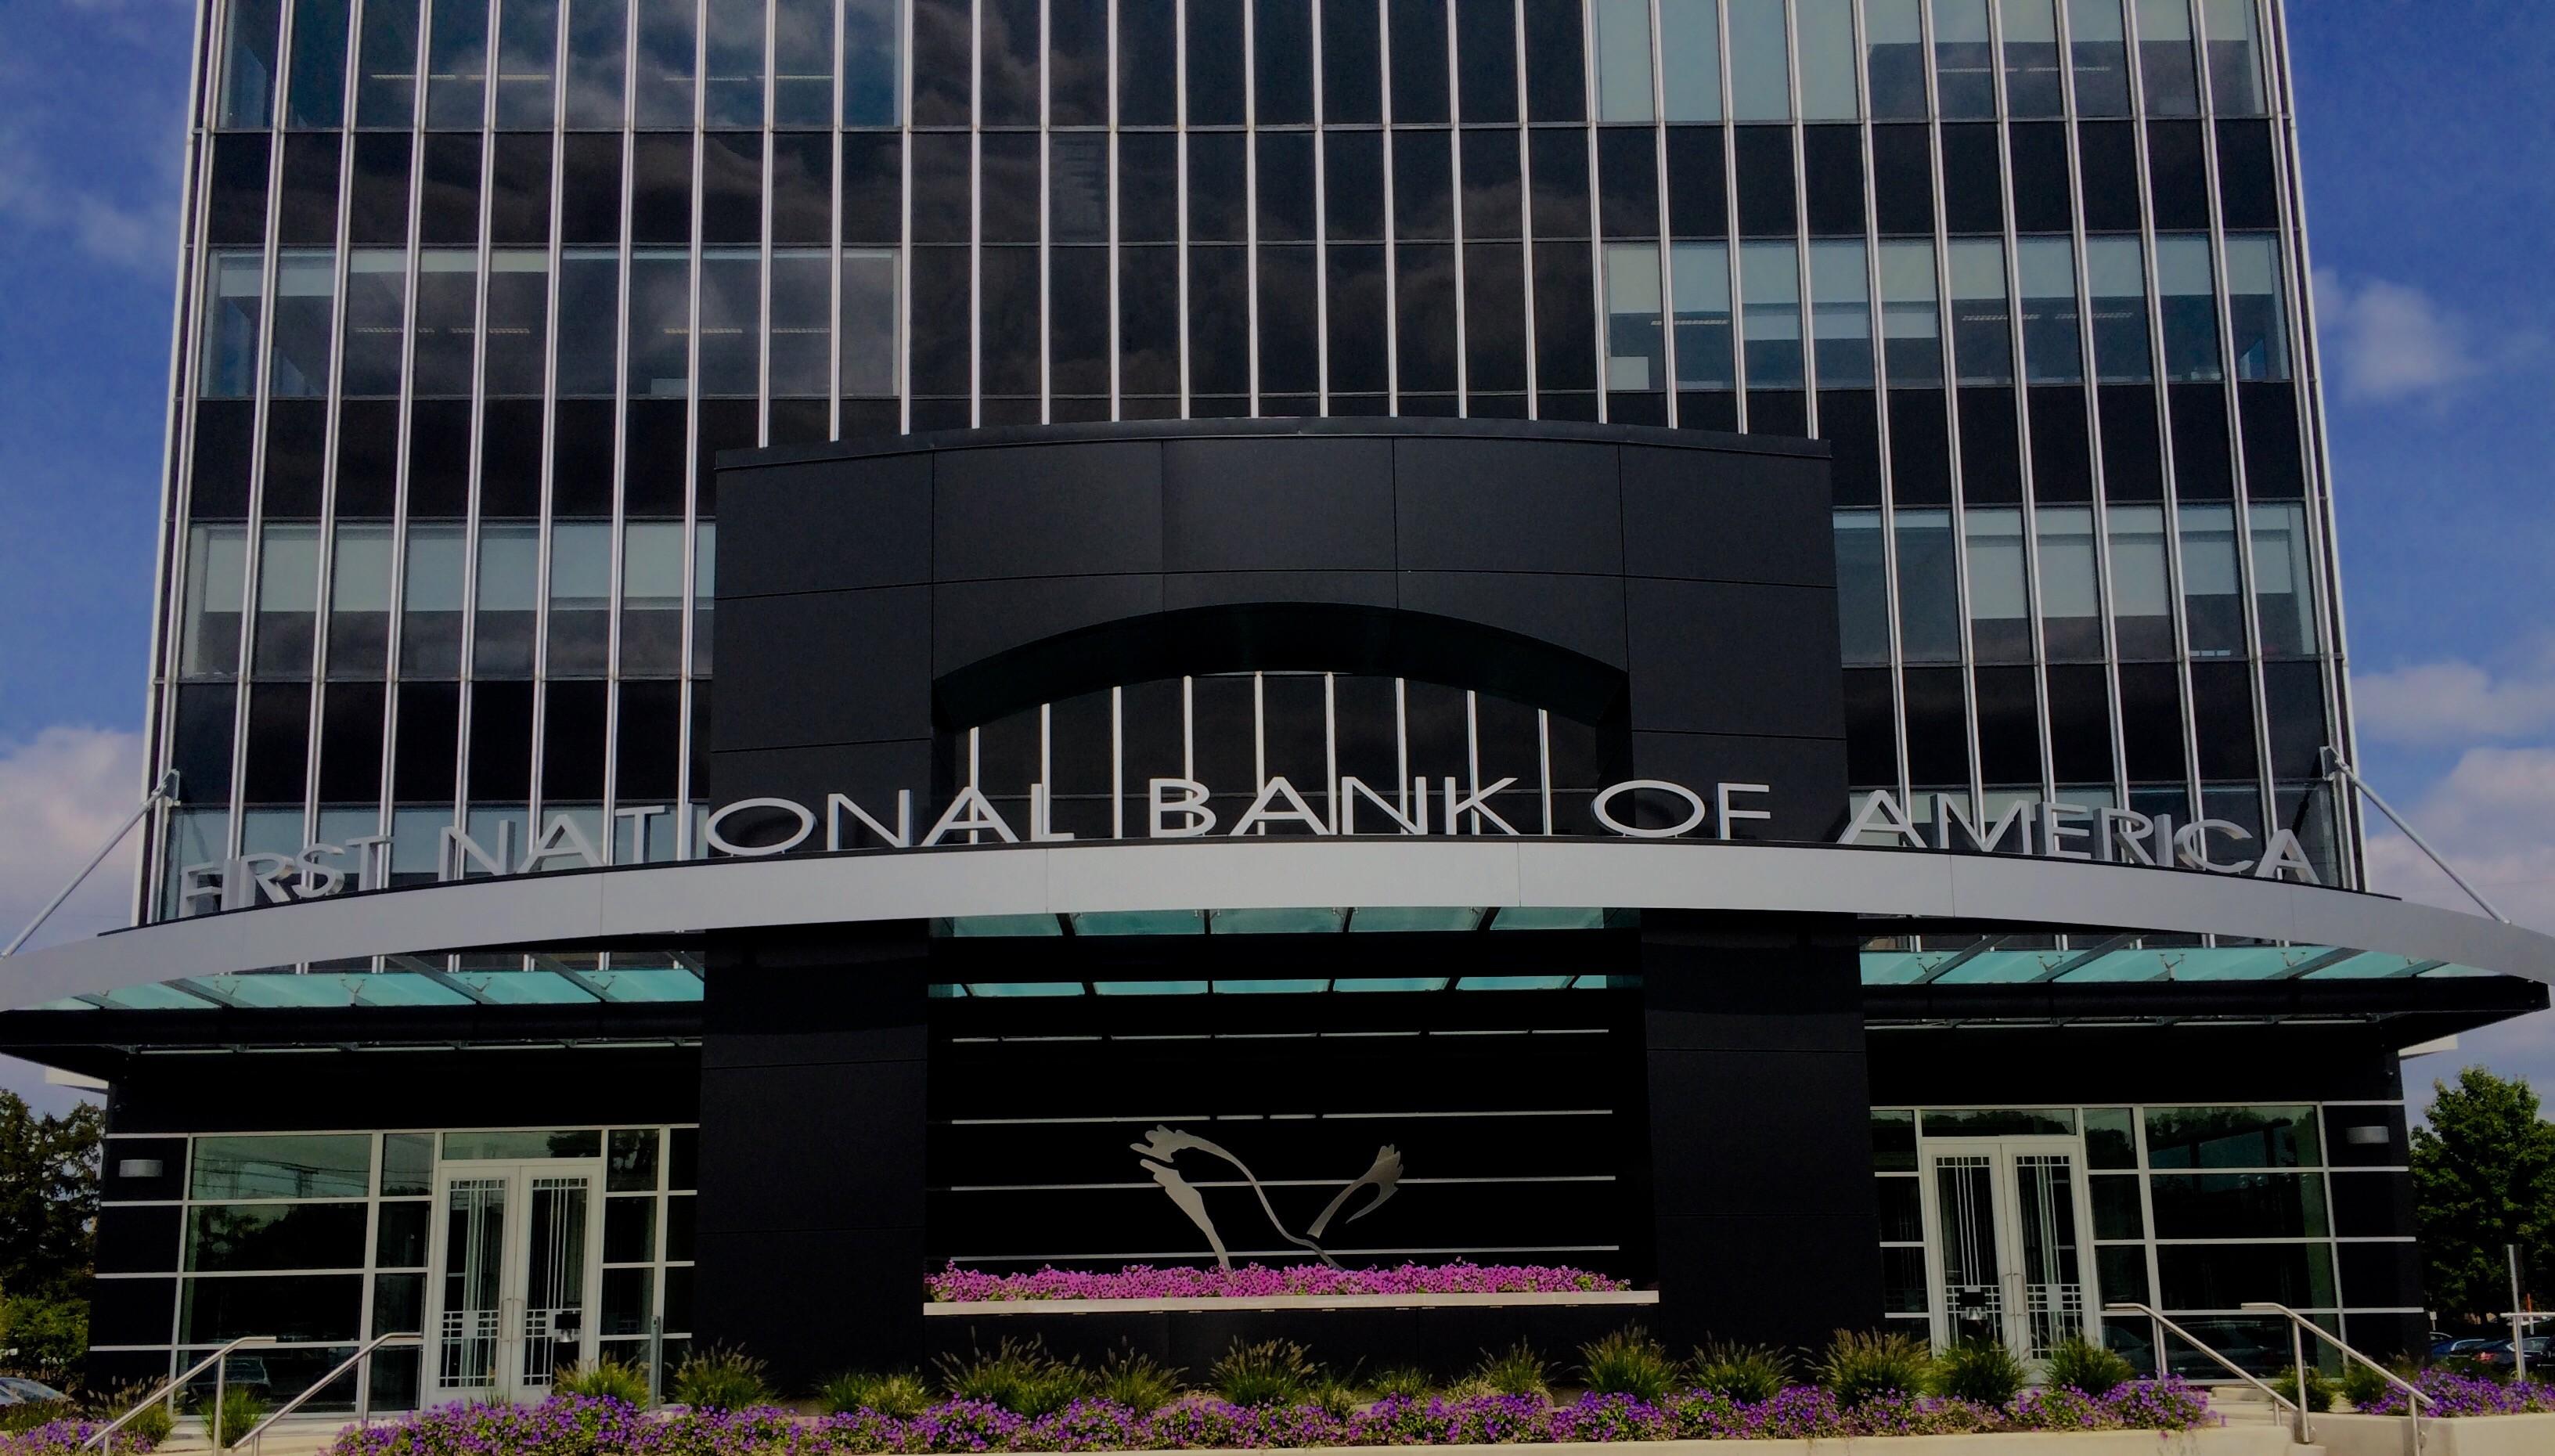 First National Bank Of America Linkedin